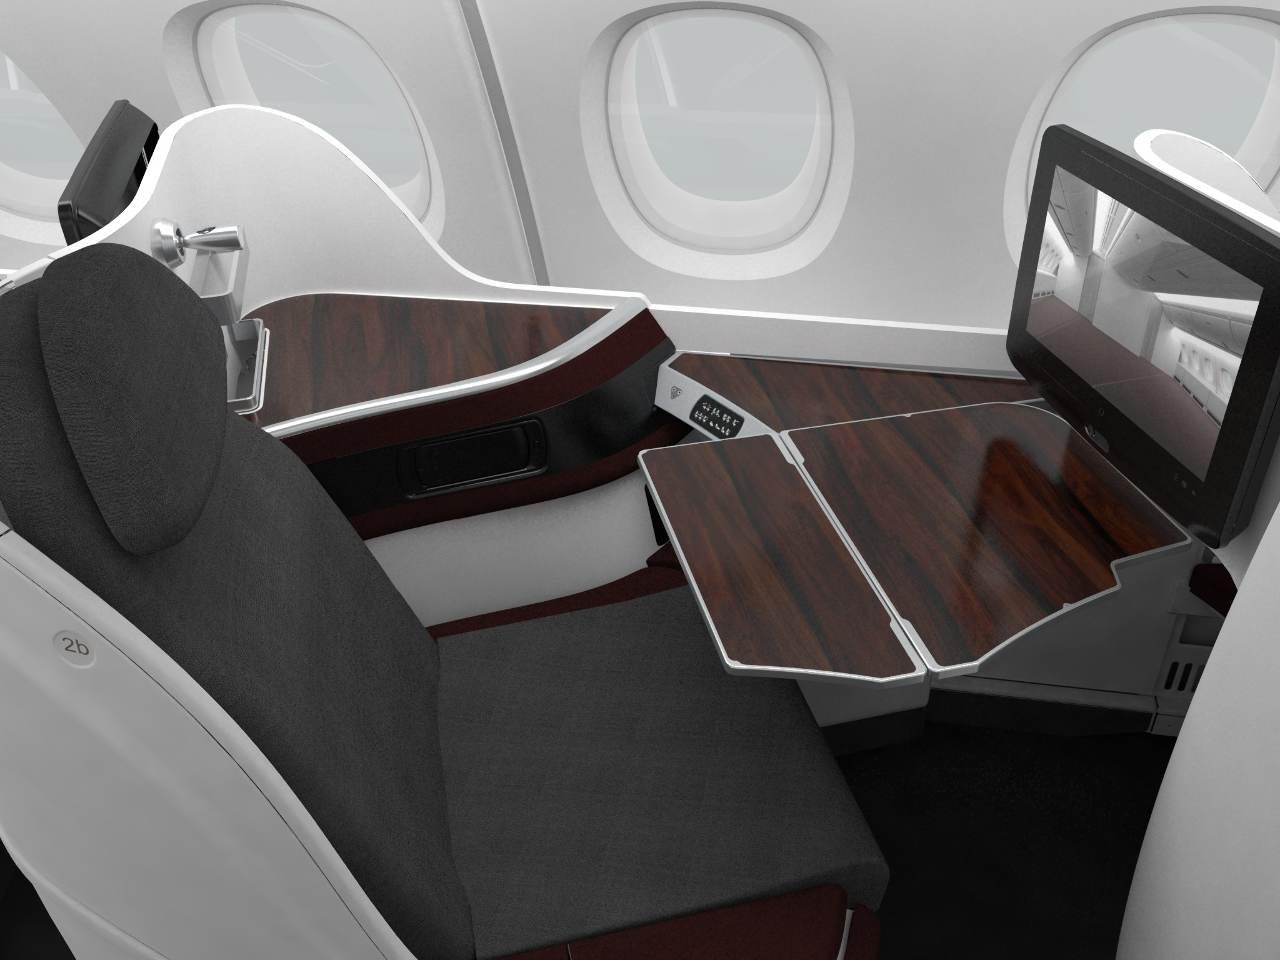 Cabine passagers : Rockwell Collins rachète B/E Aerospace